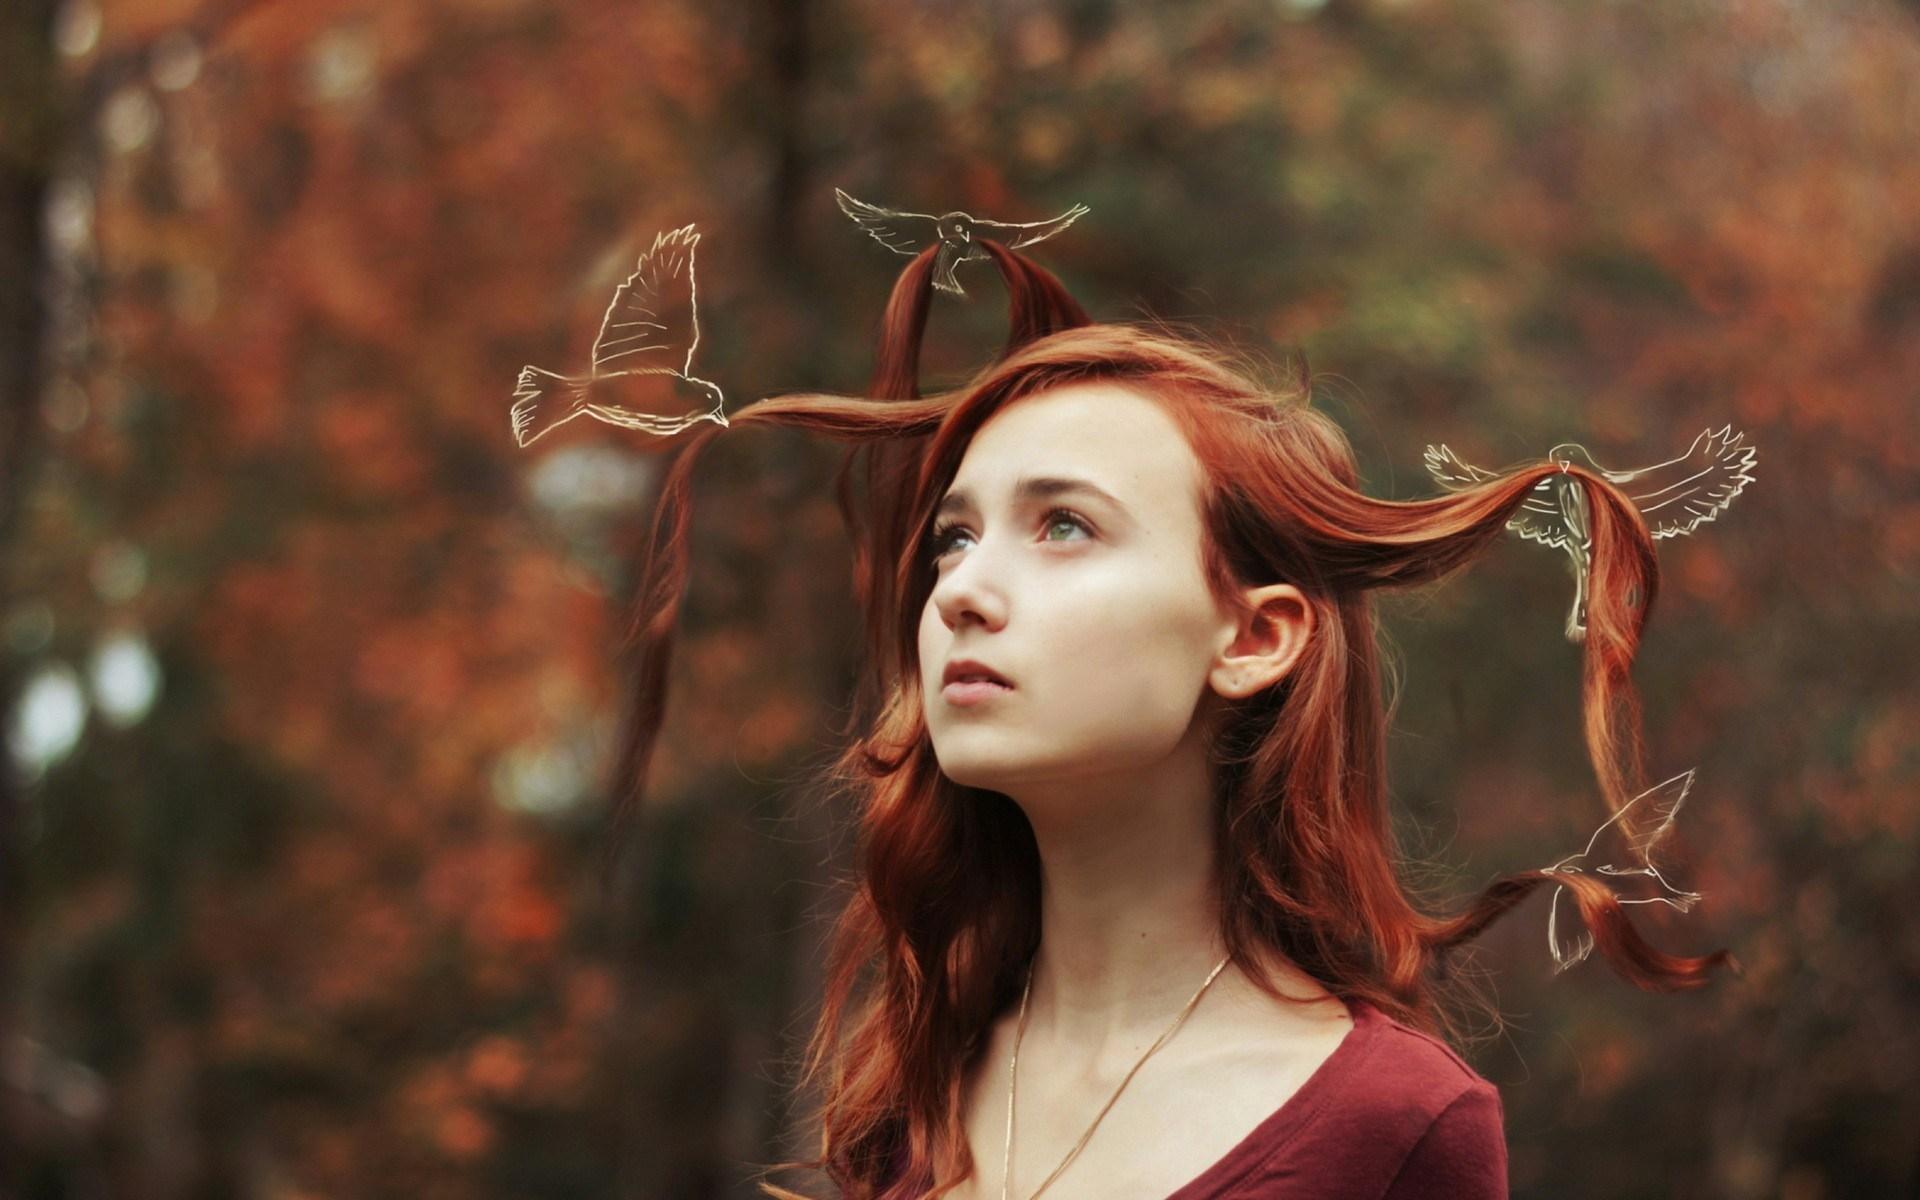 Redhead Girl Birds Art Photo